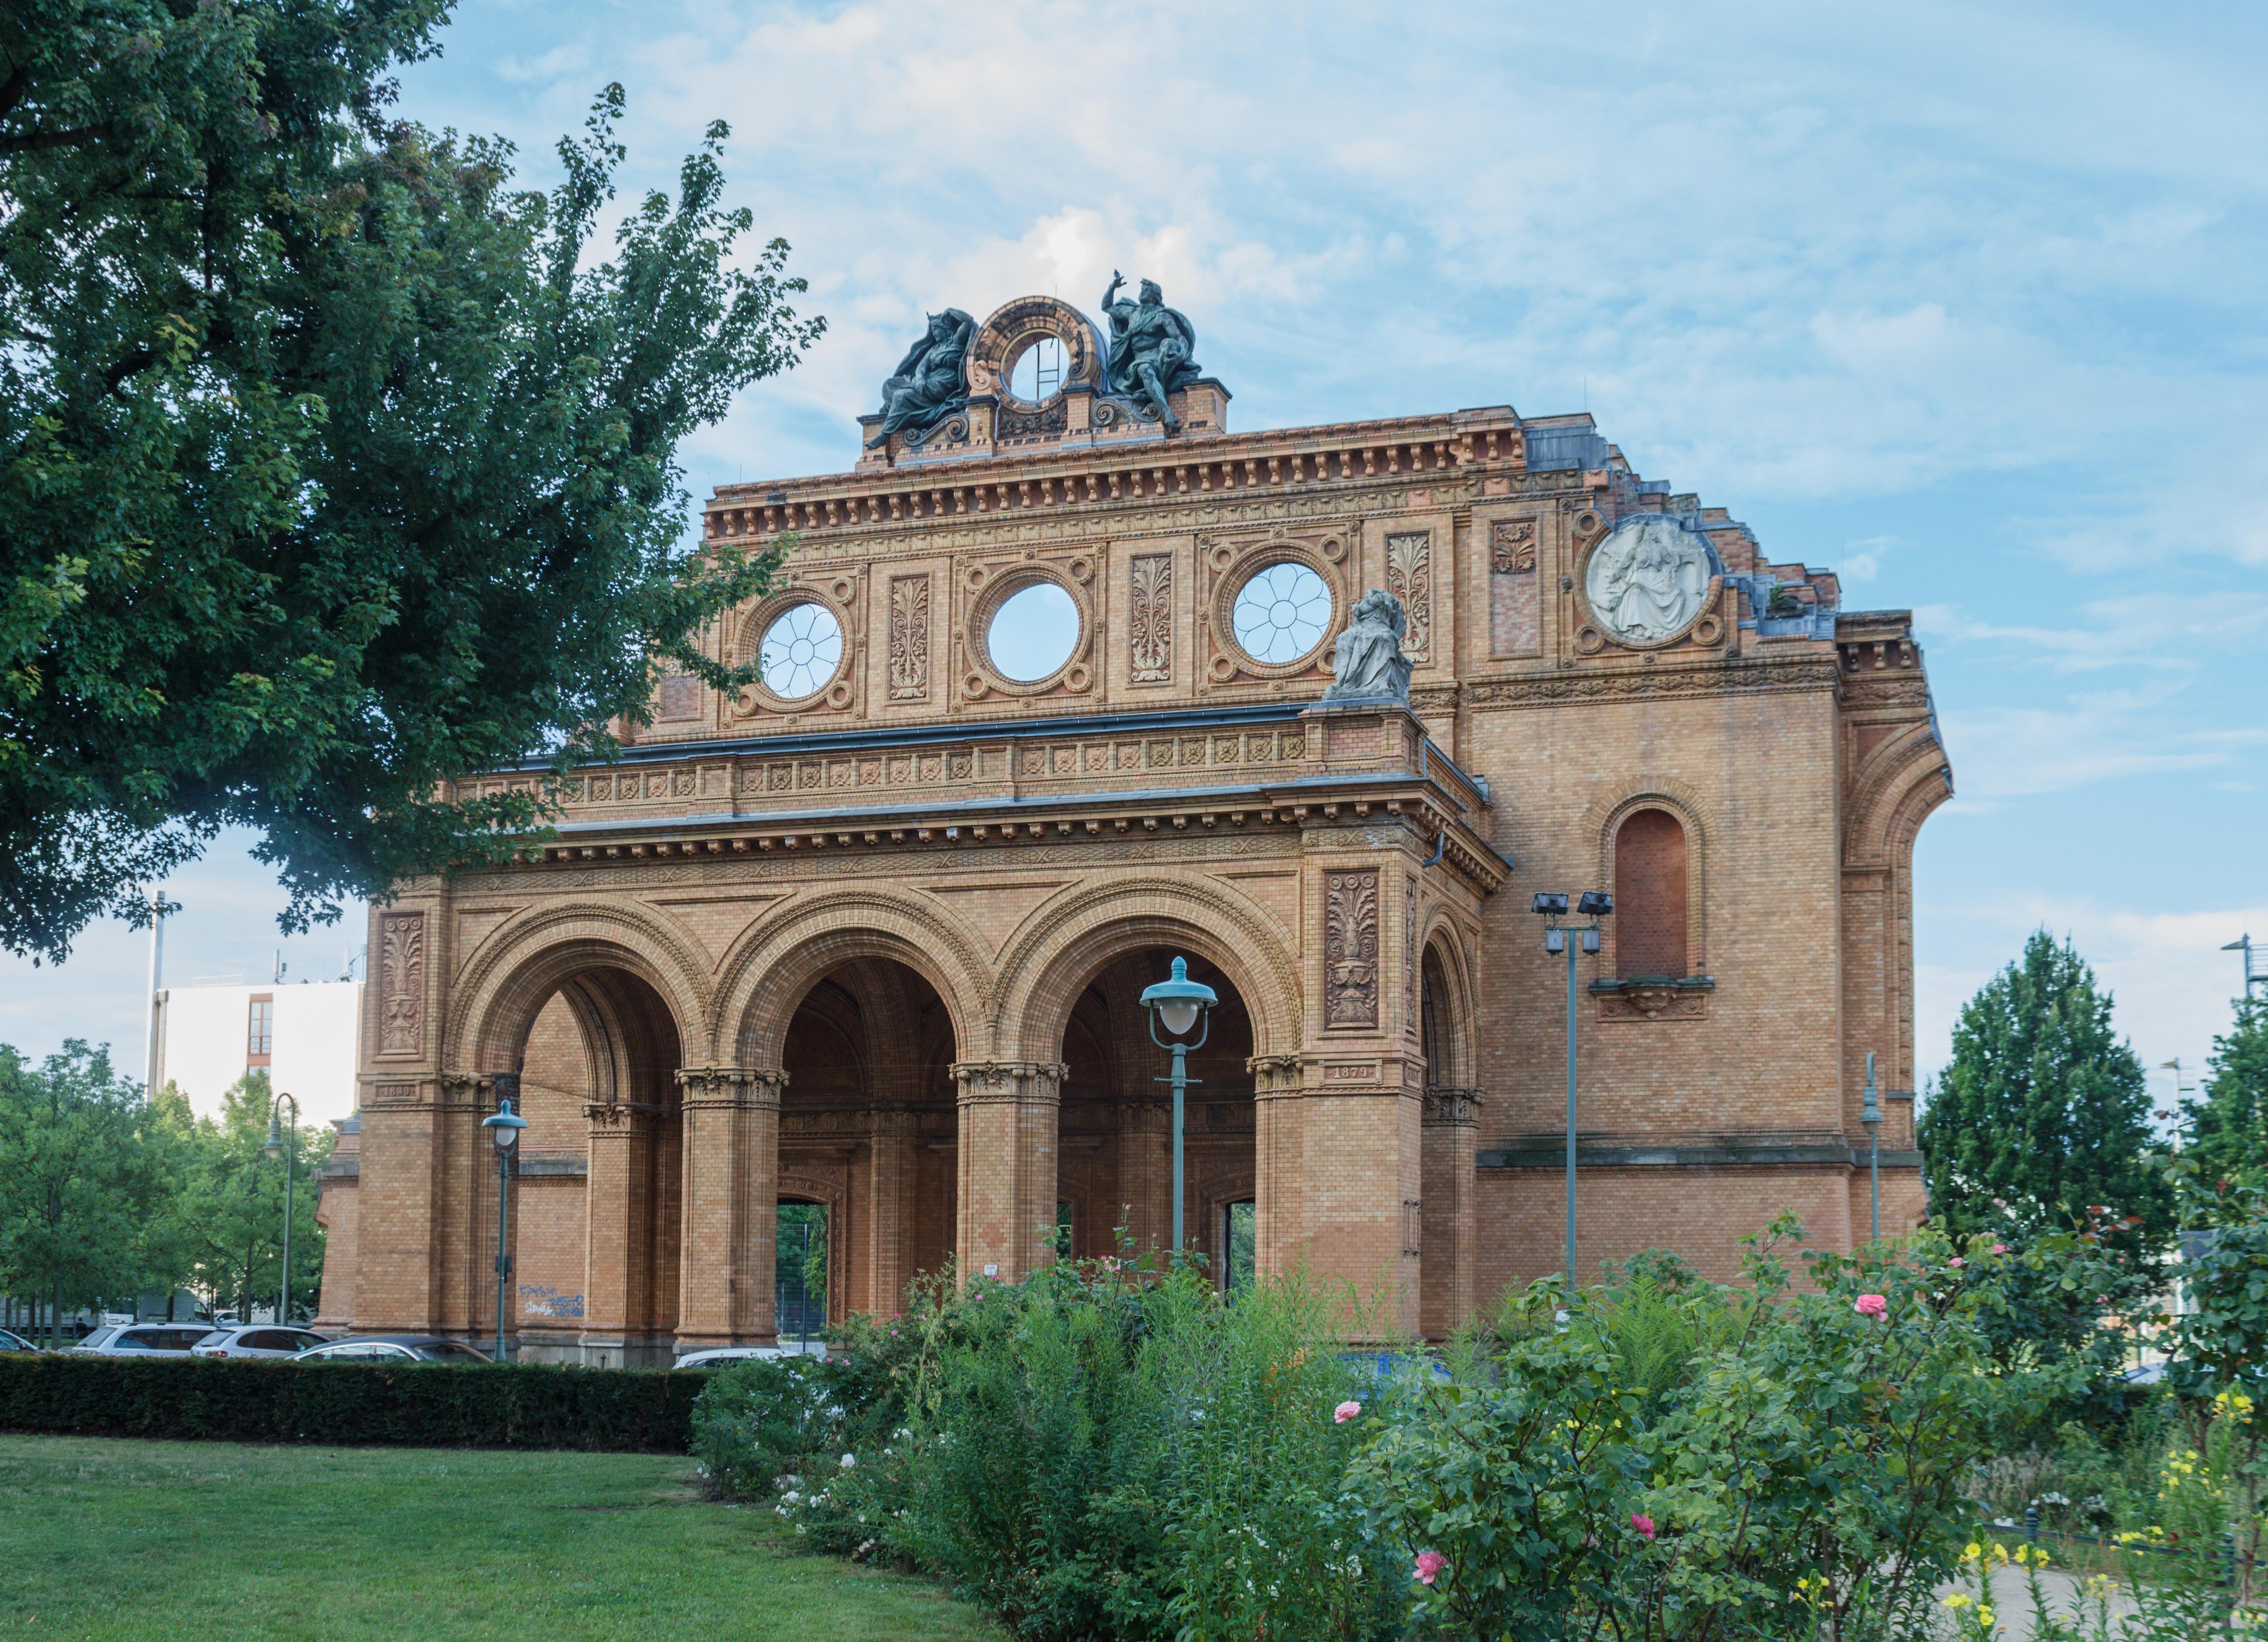 Anhalter_Bahnhof%2C_Berlin%2C_Germany%2C_2014-07-13-3369.jpg